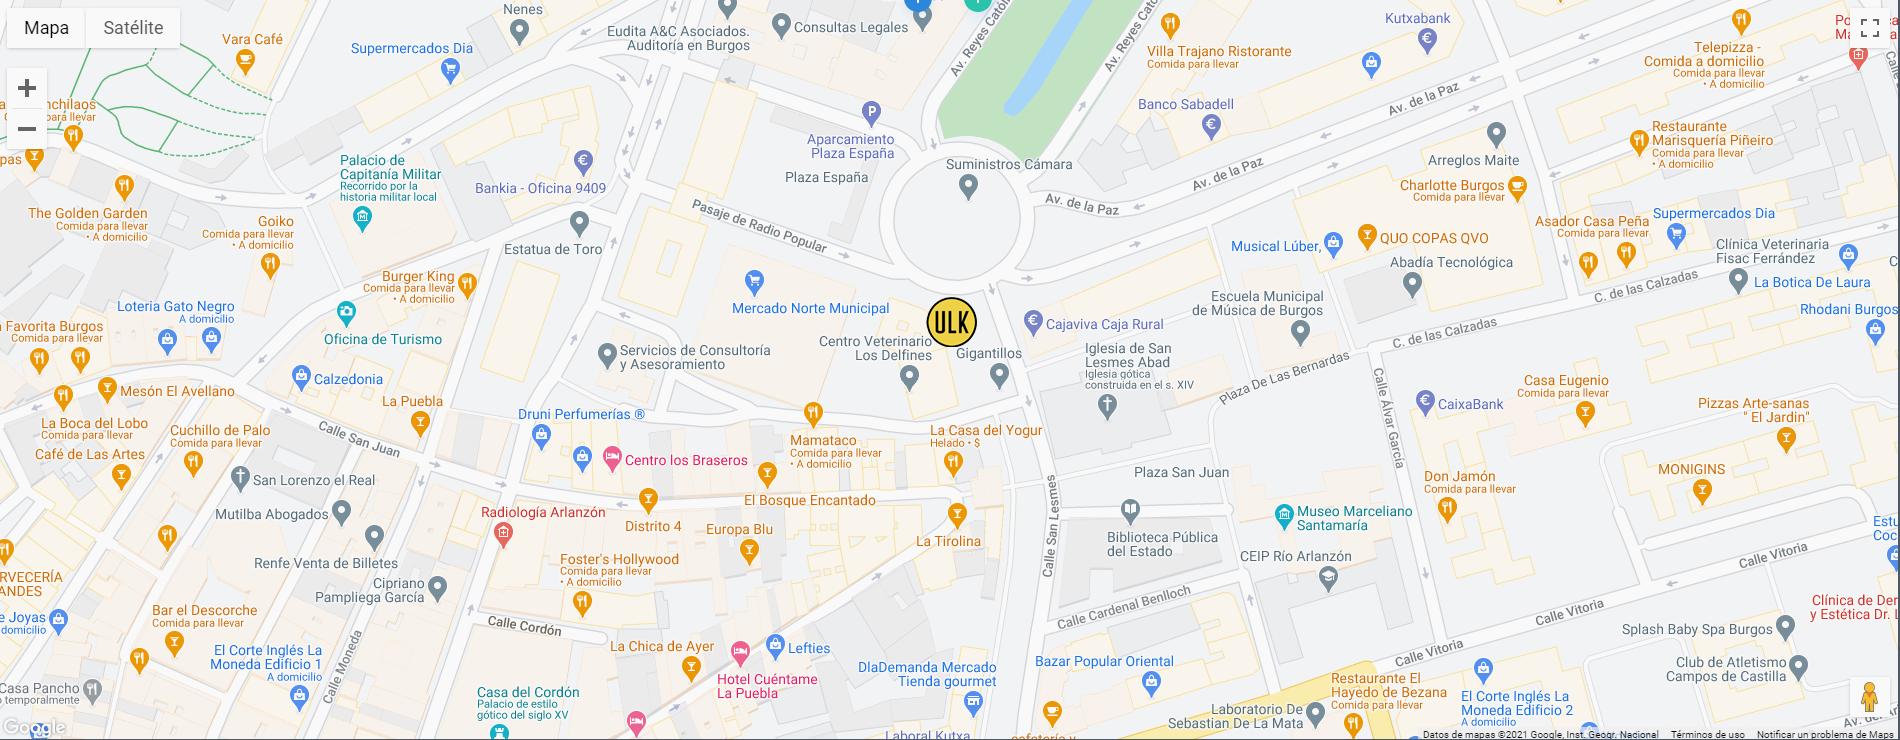 ulk-consulting-map